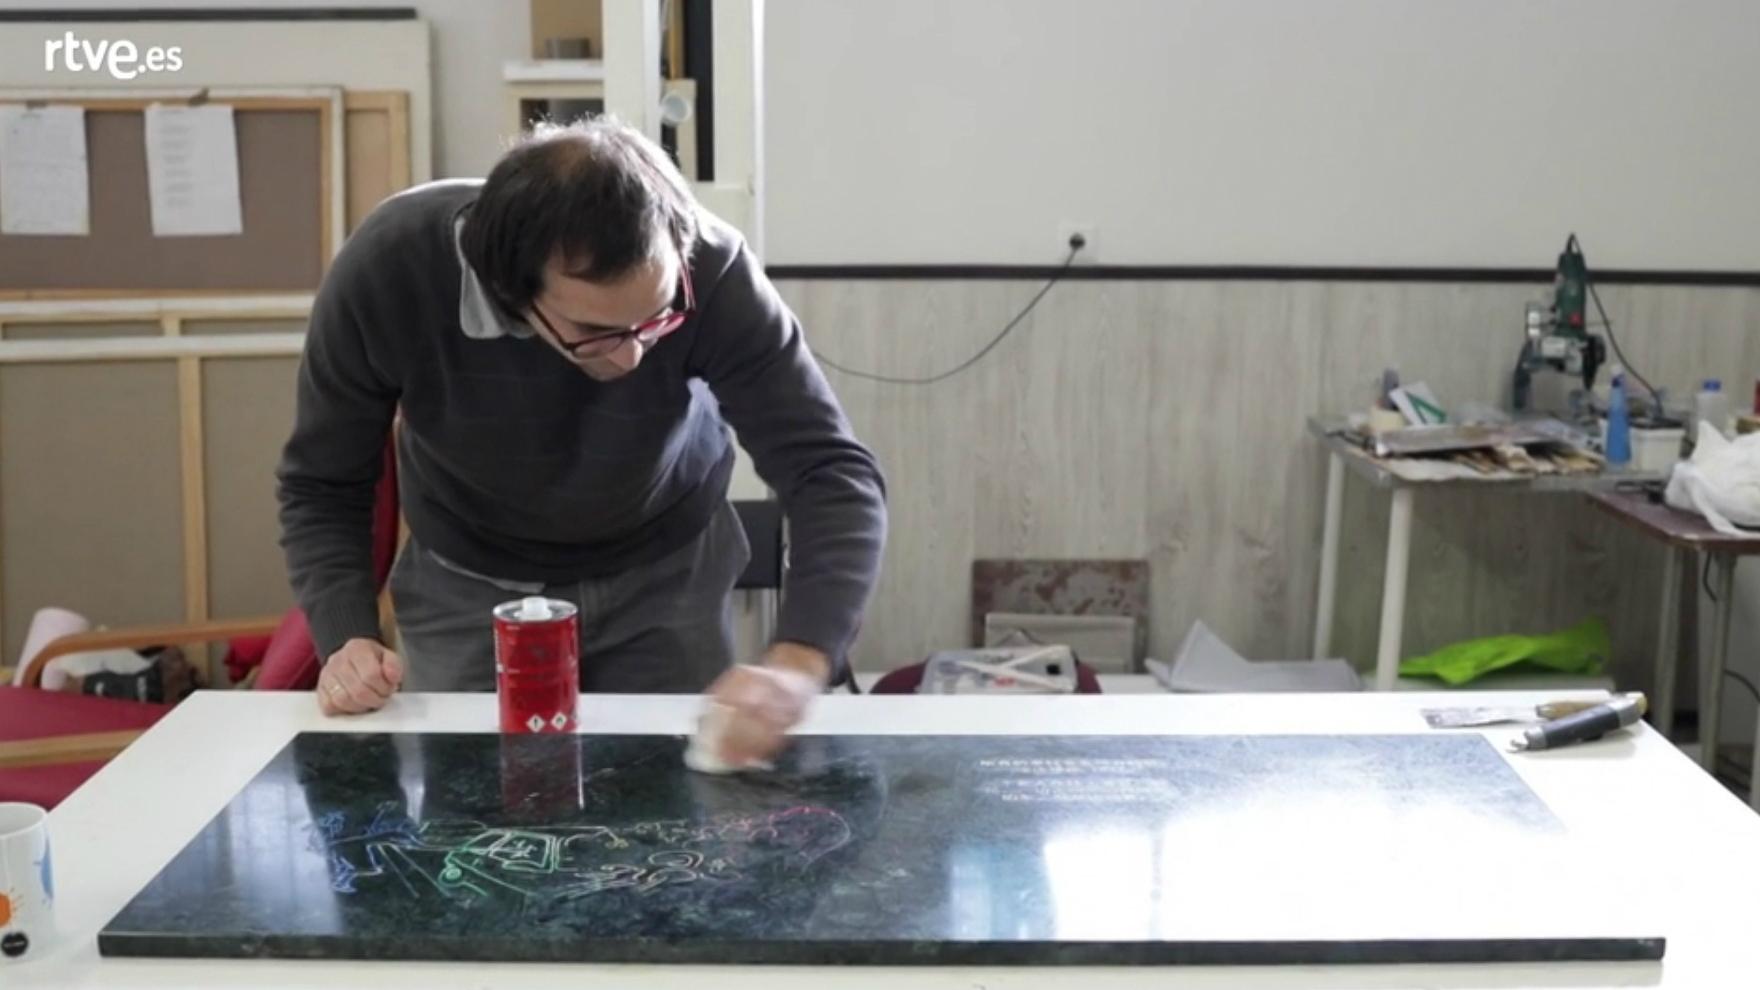 Desatados - Daniel Silvo, Artista multidisciplinar - 12/01/18